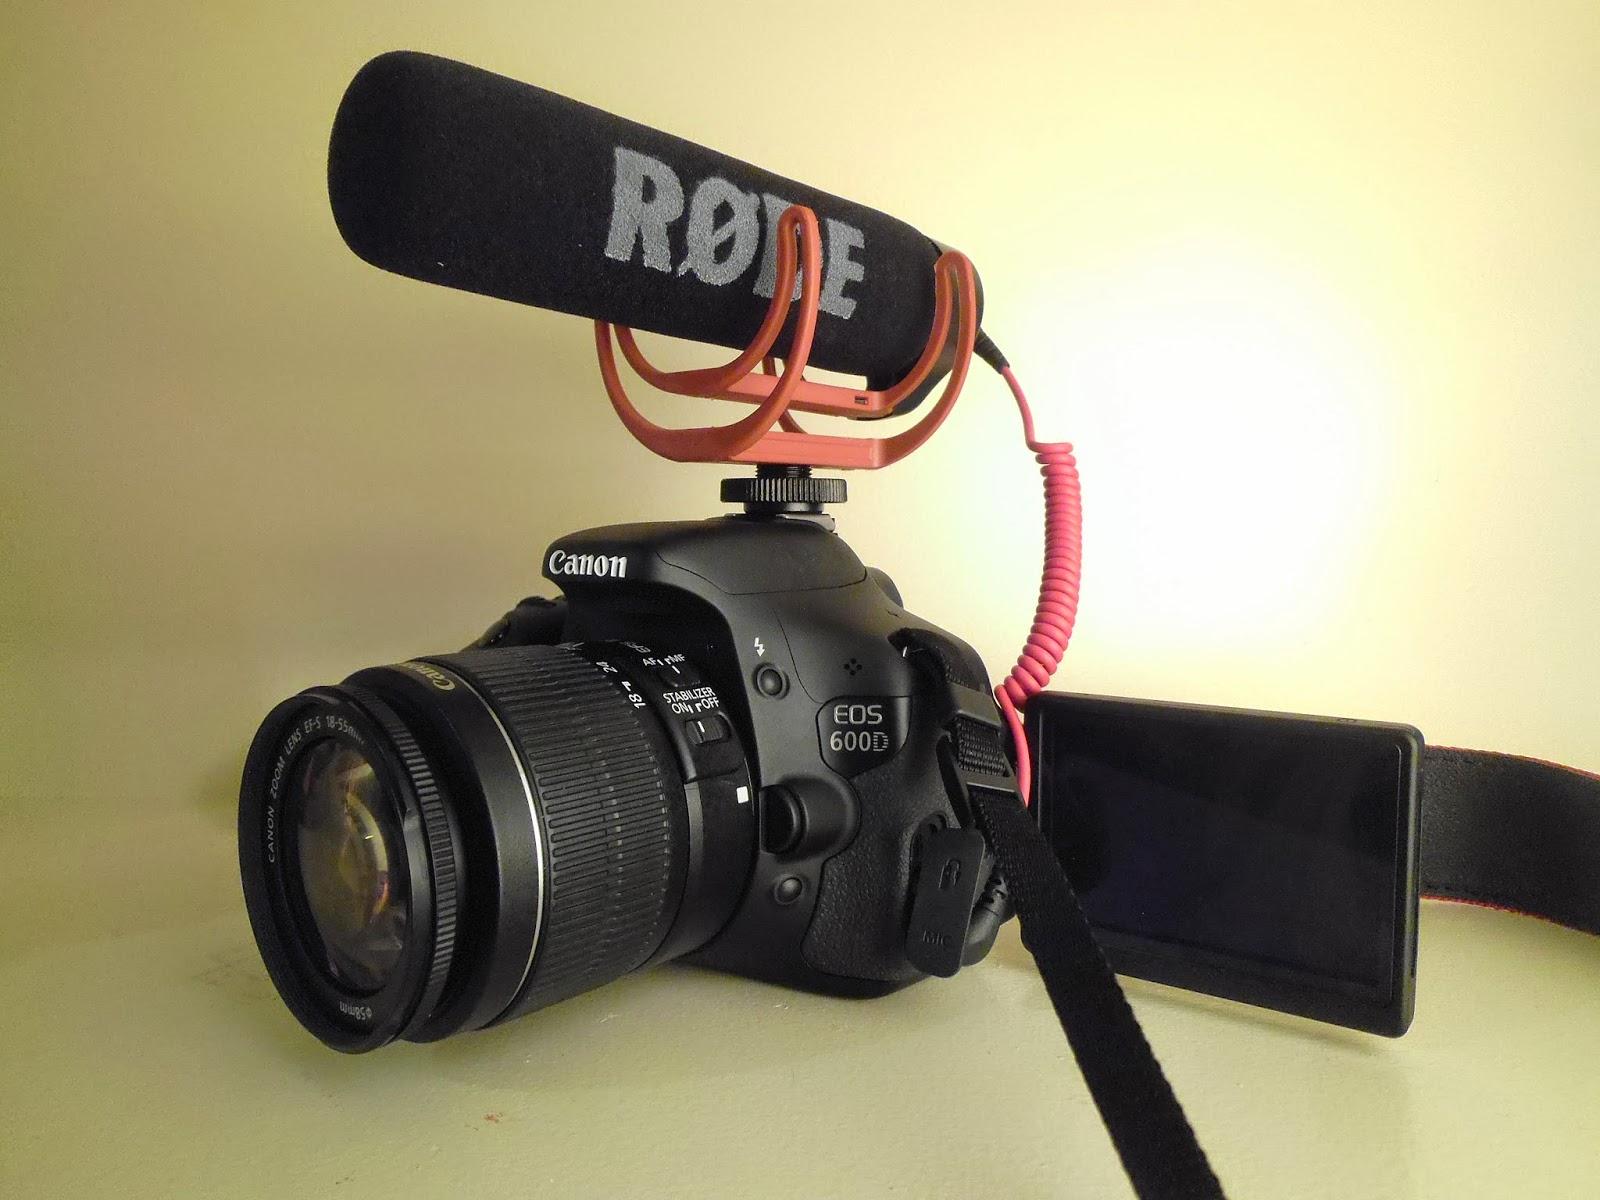 Kiwse: My Filming Setup | Canon 600D/ T3i + Rode VideoMic GO